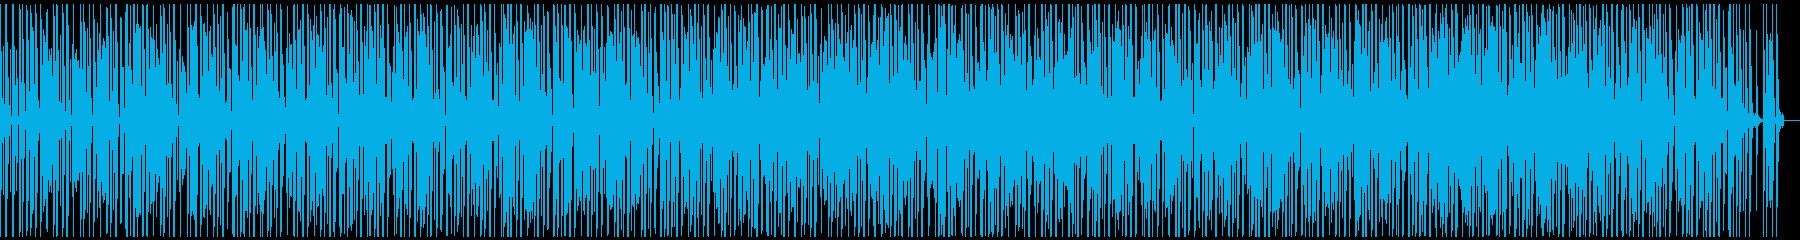 Lo-Fiビート_ファンキー&ジャジーの再生済みの波形